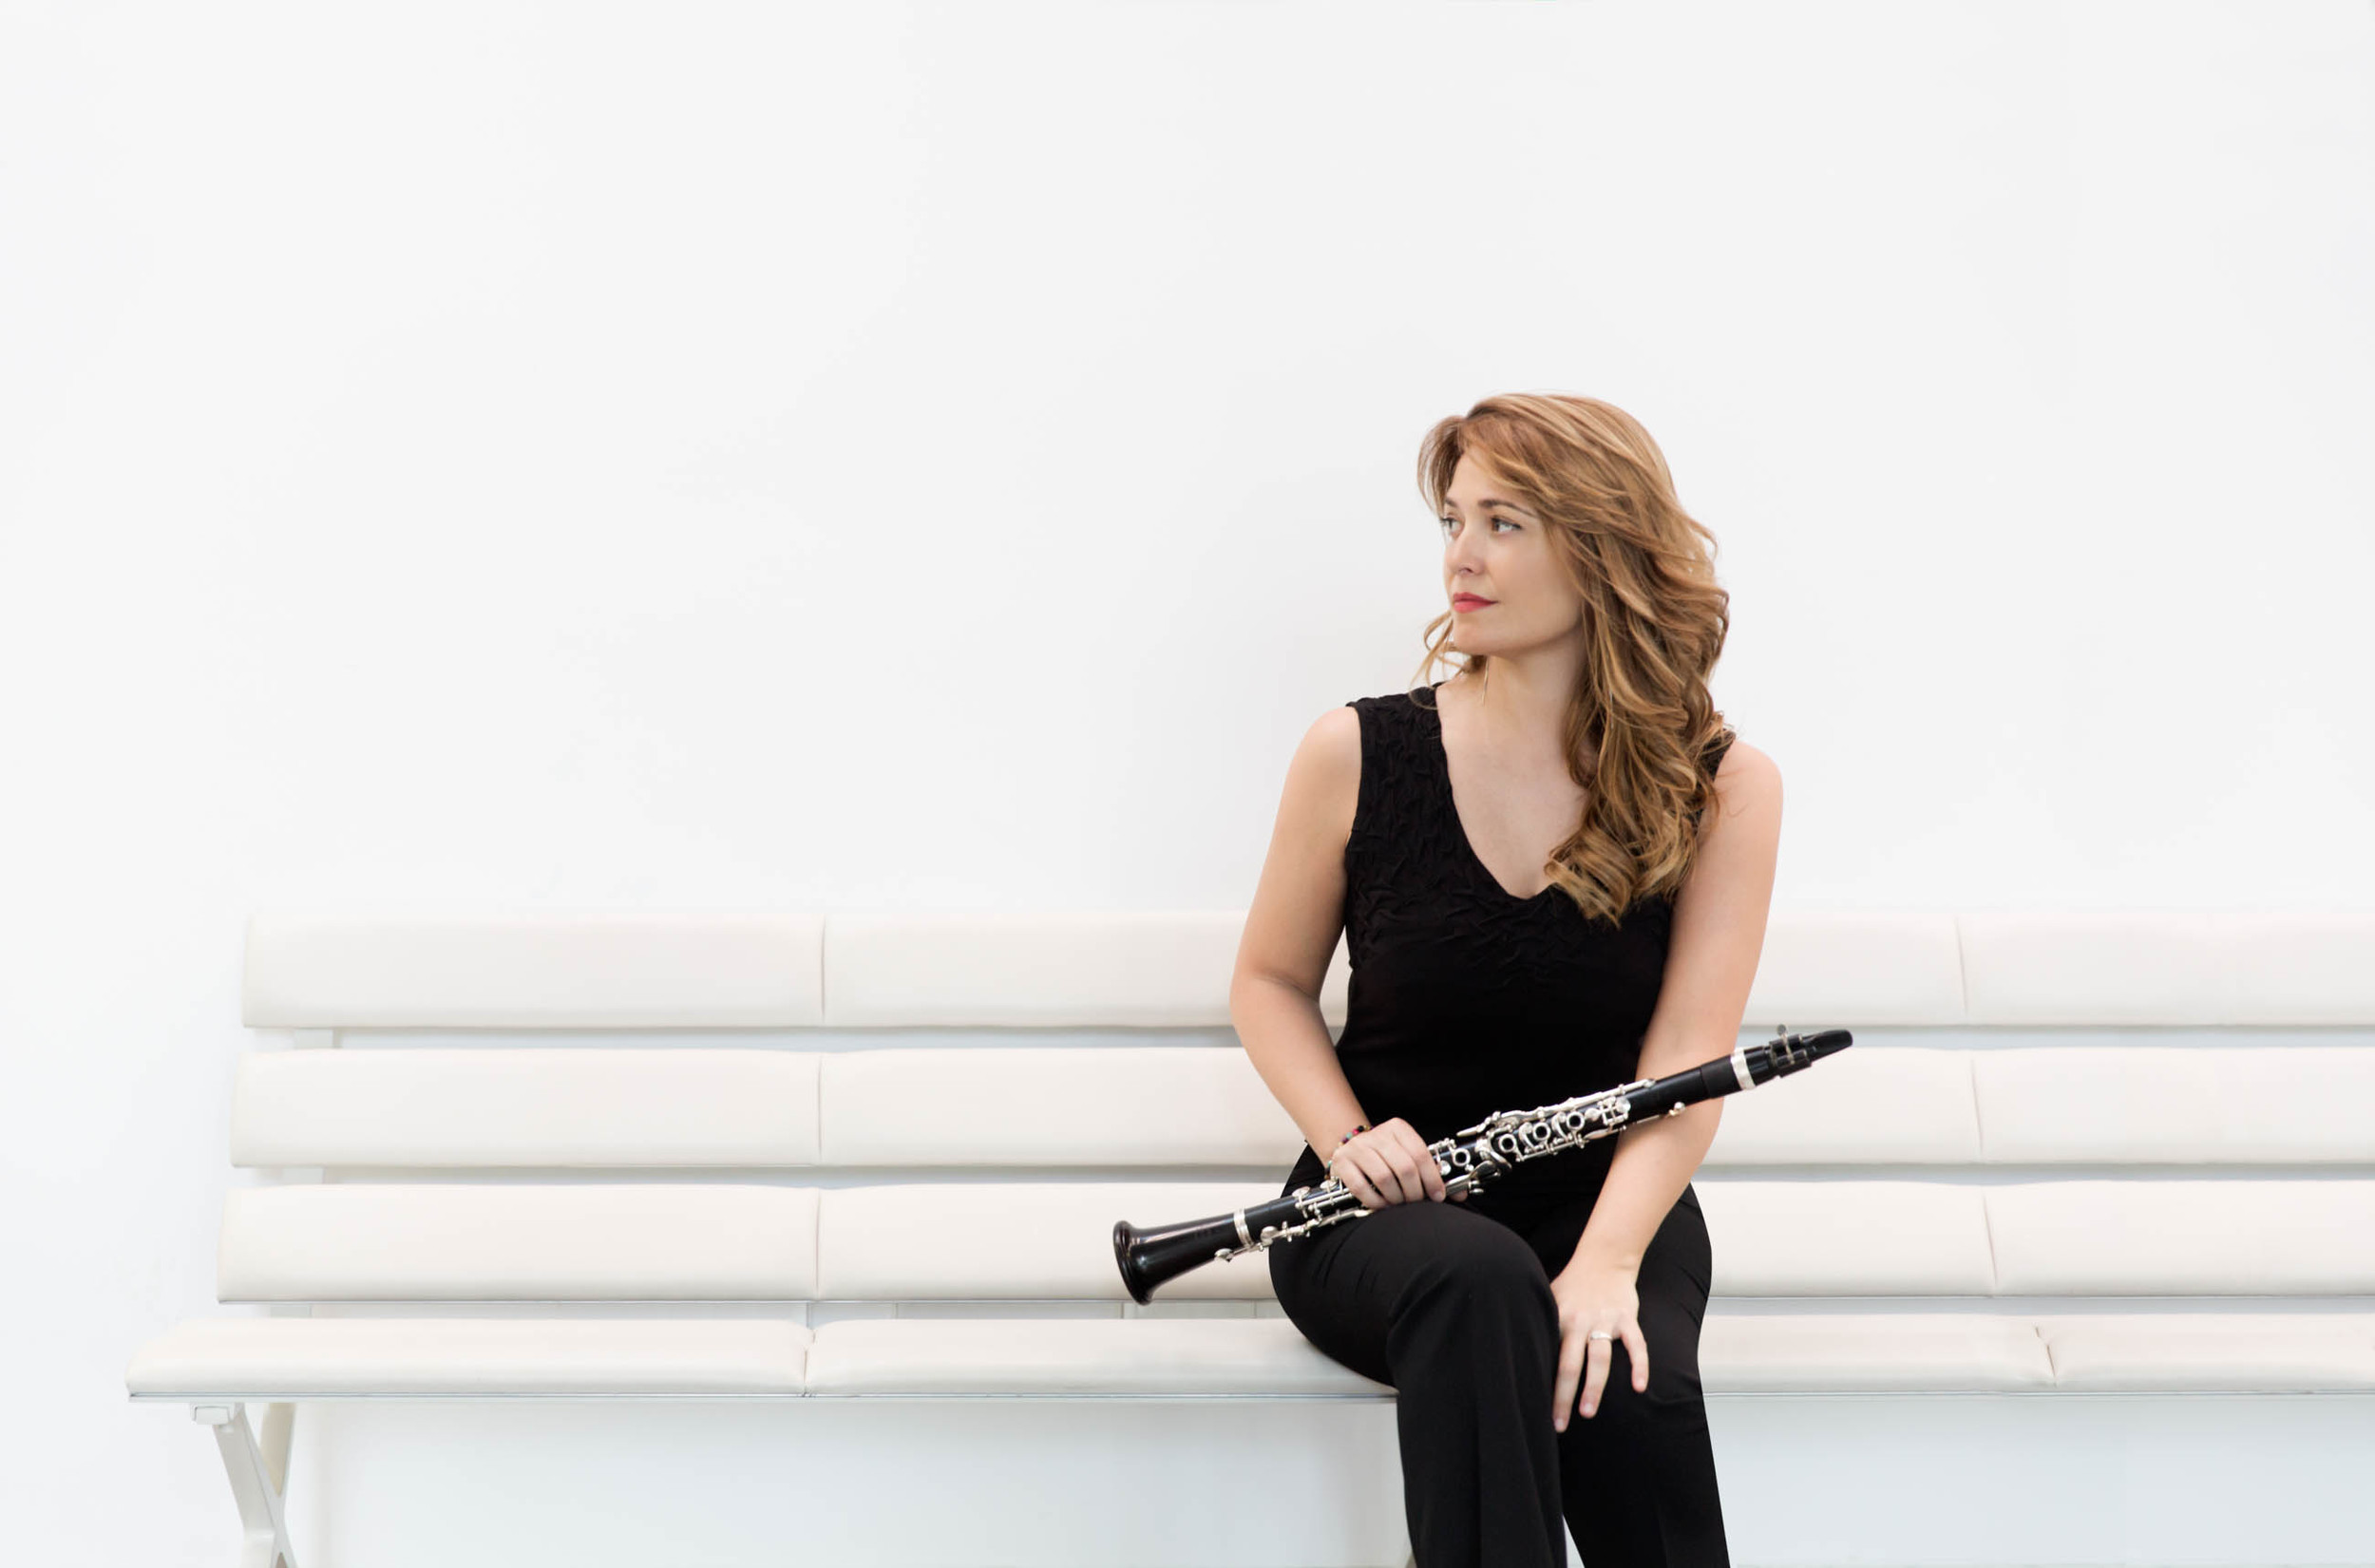 Laura Ruiz Ferreres